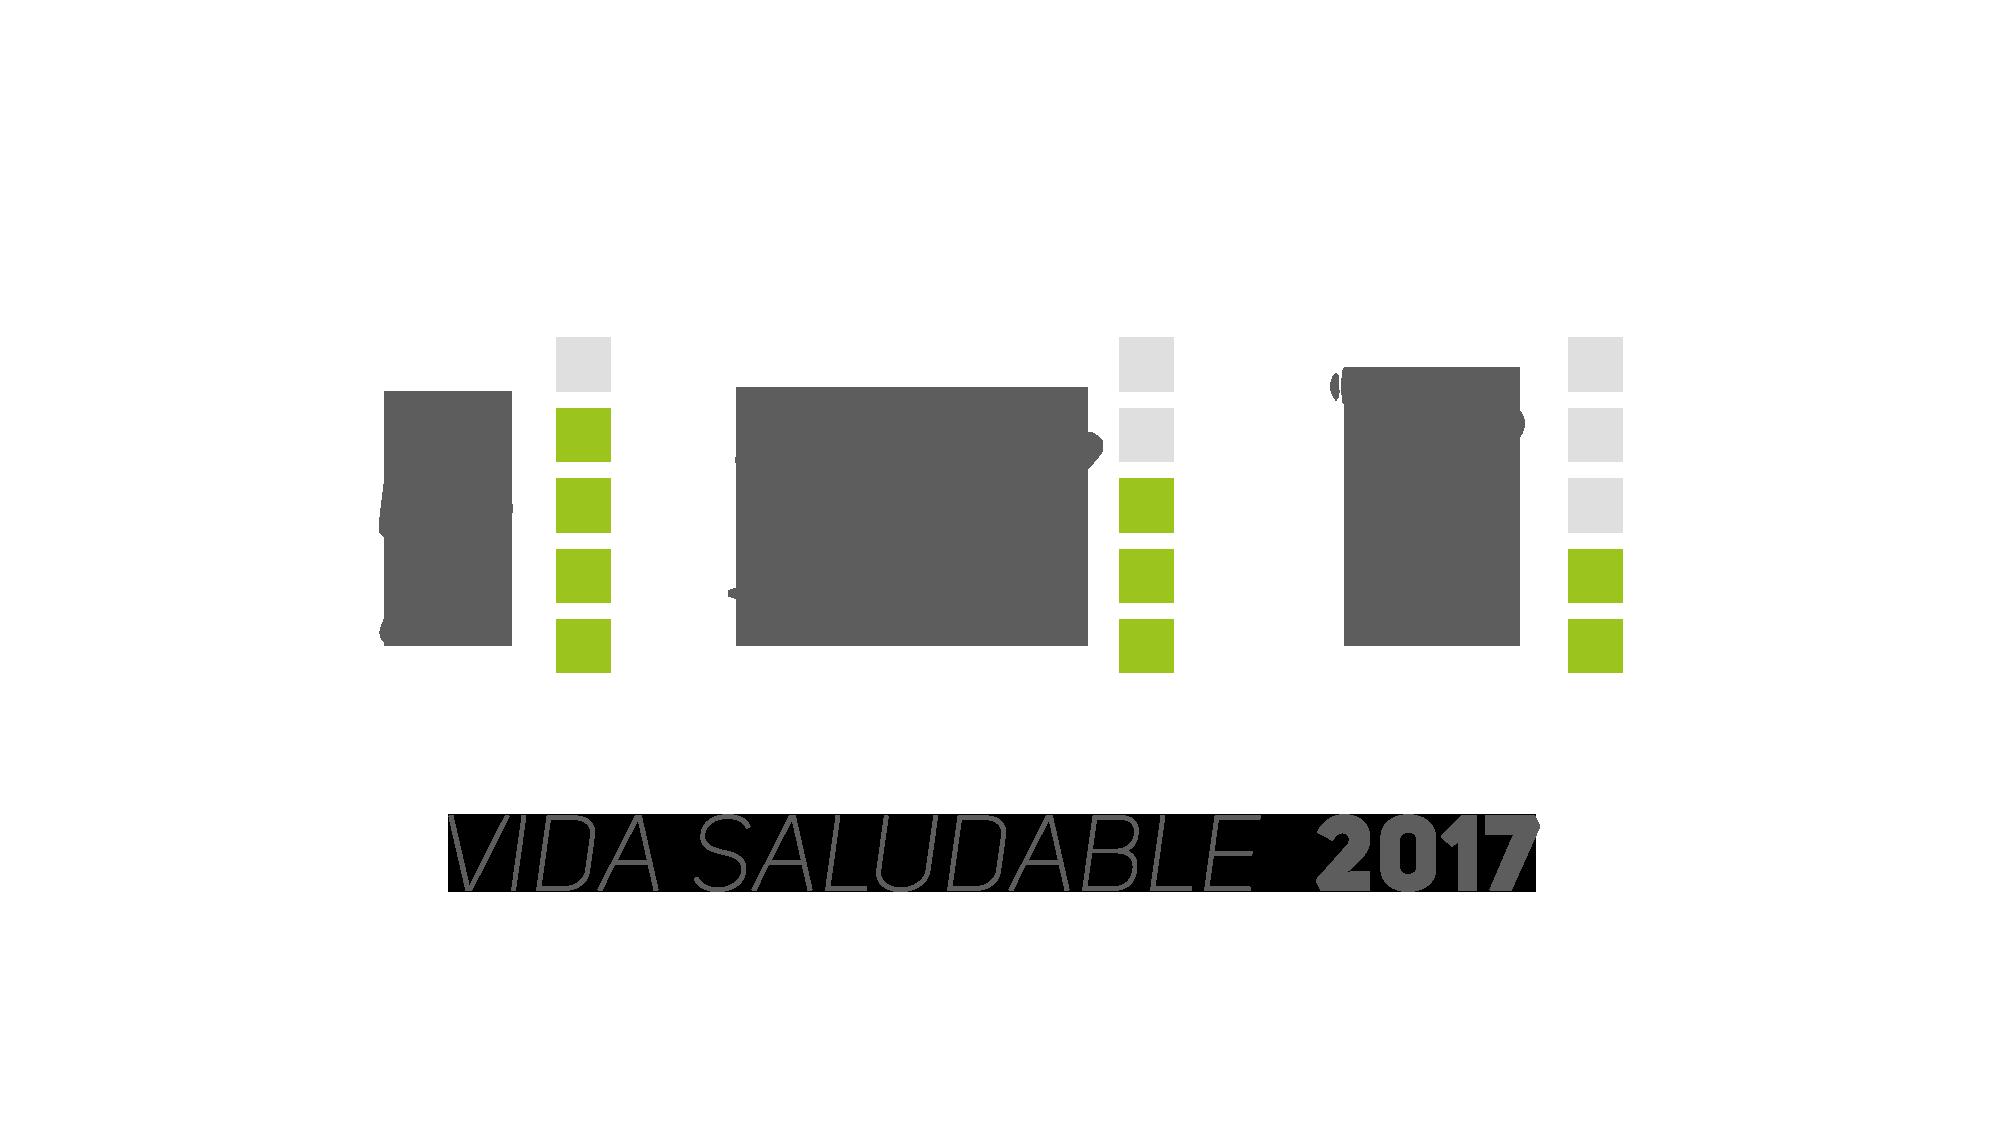 Vida Saludable 2017